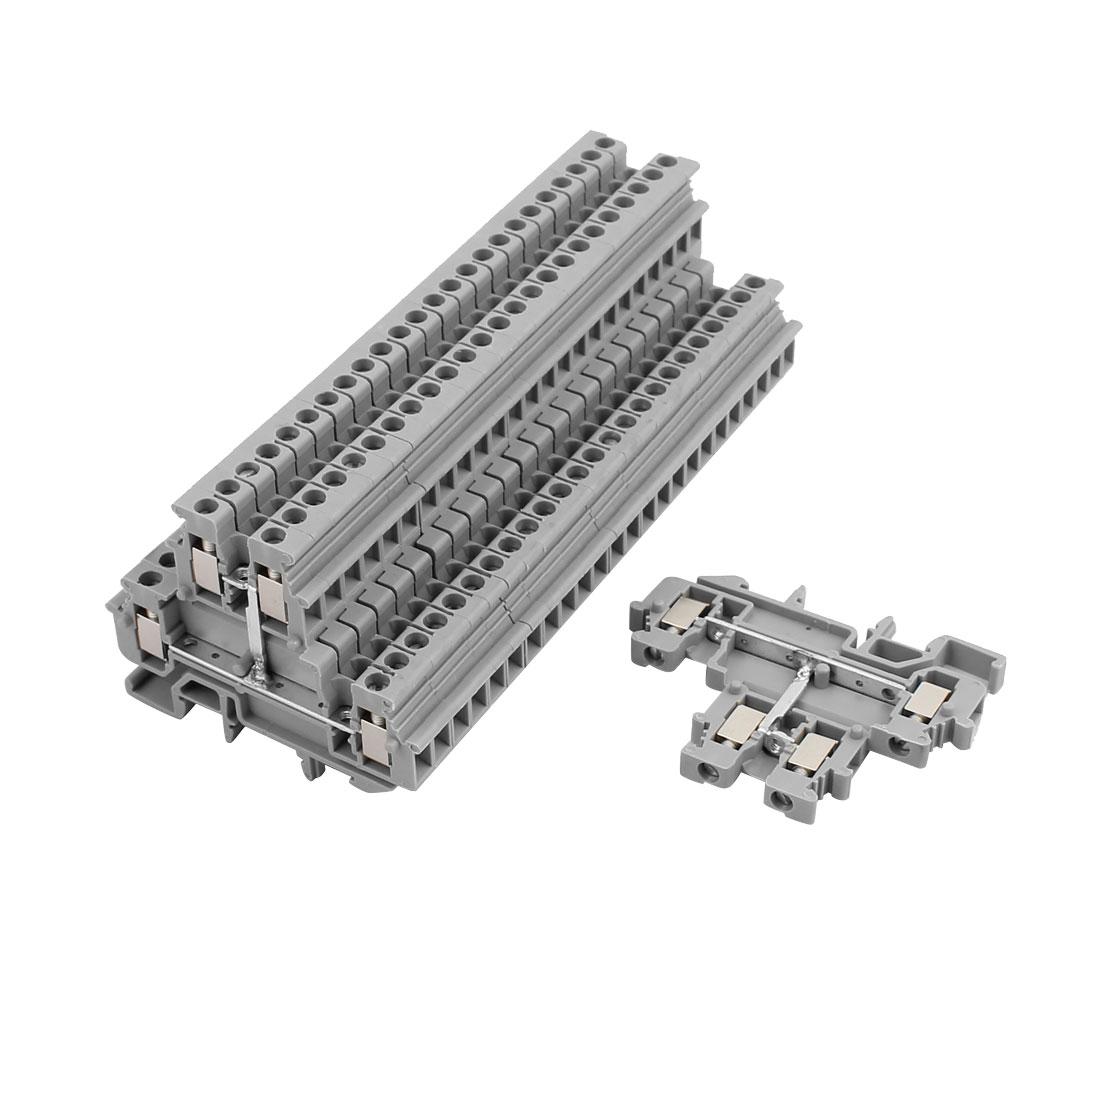 25Pcs MBKKB2.5 DIN Rail Mount Double-level Terminal Block 500V 32A Gray